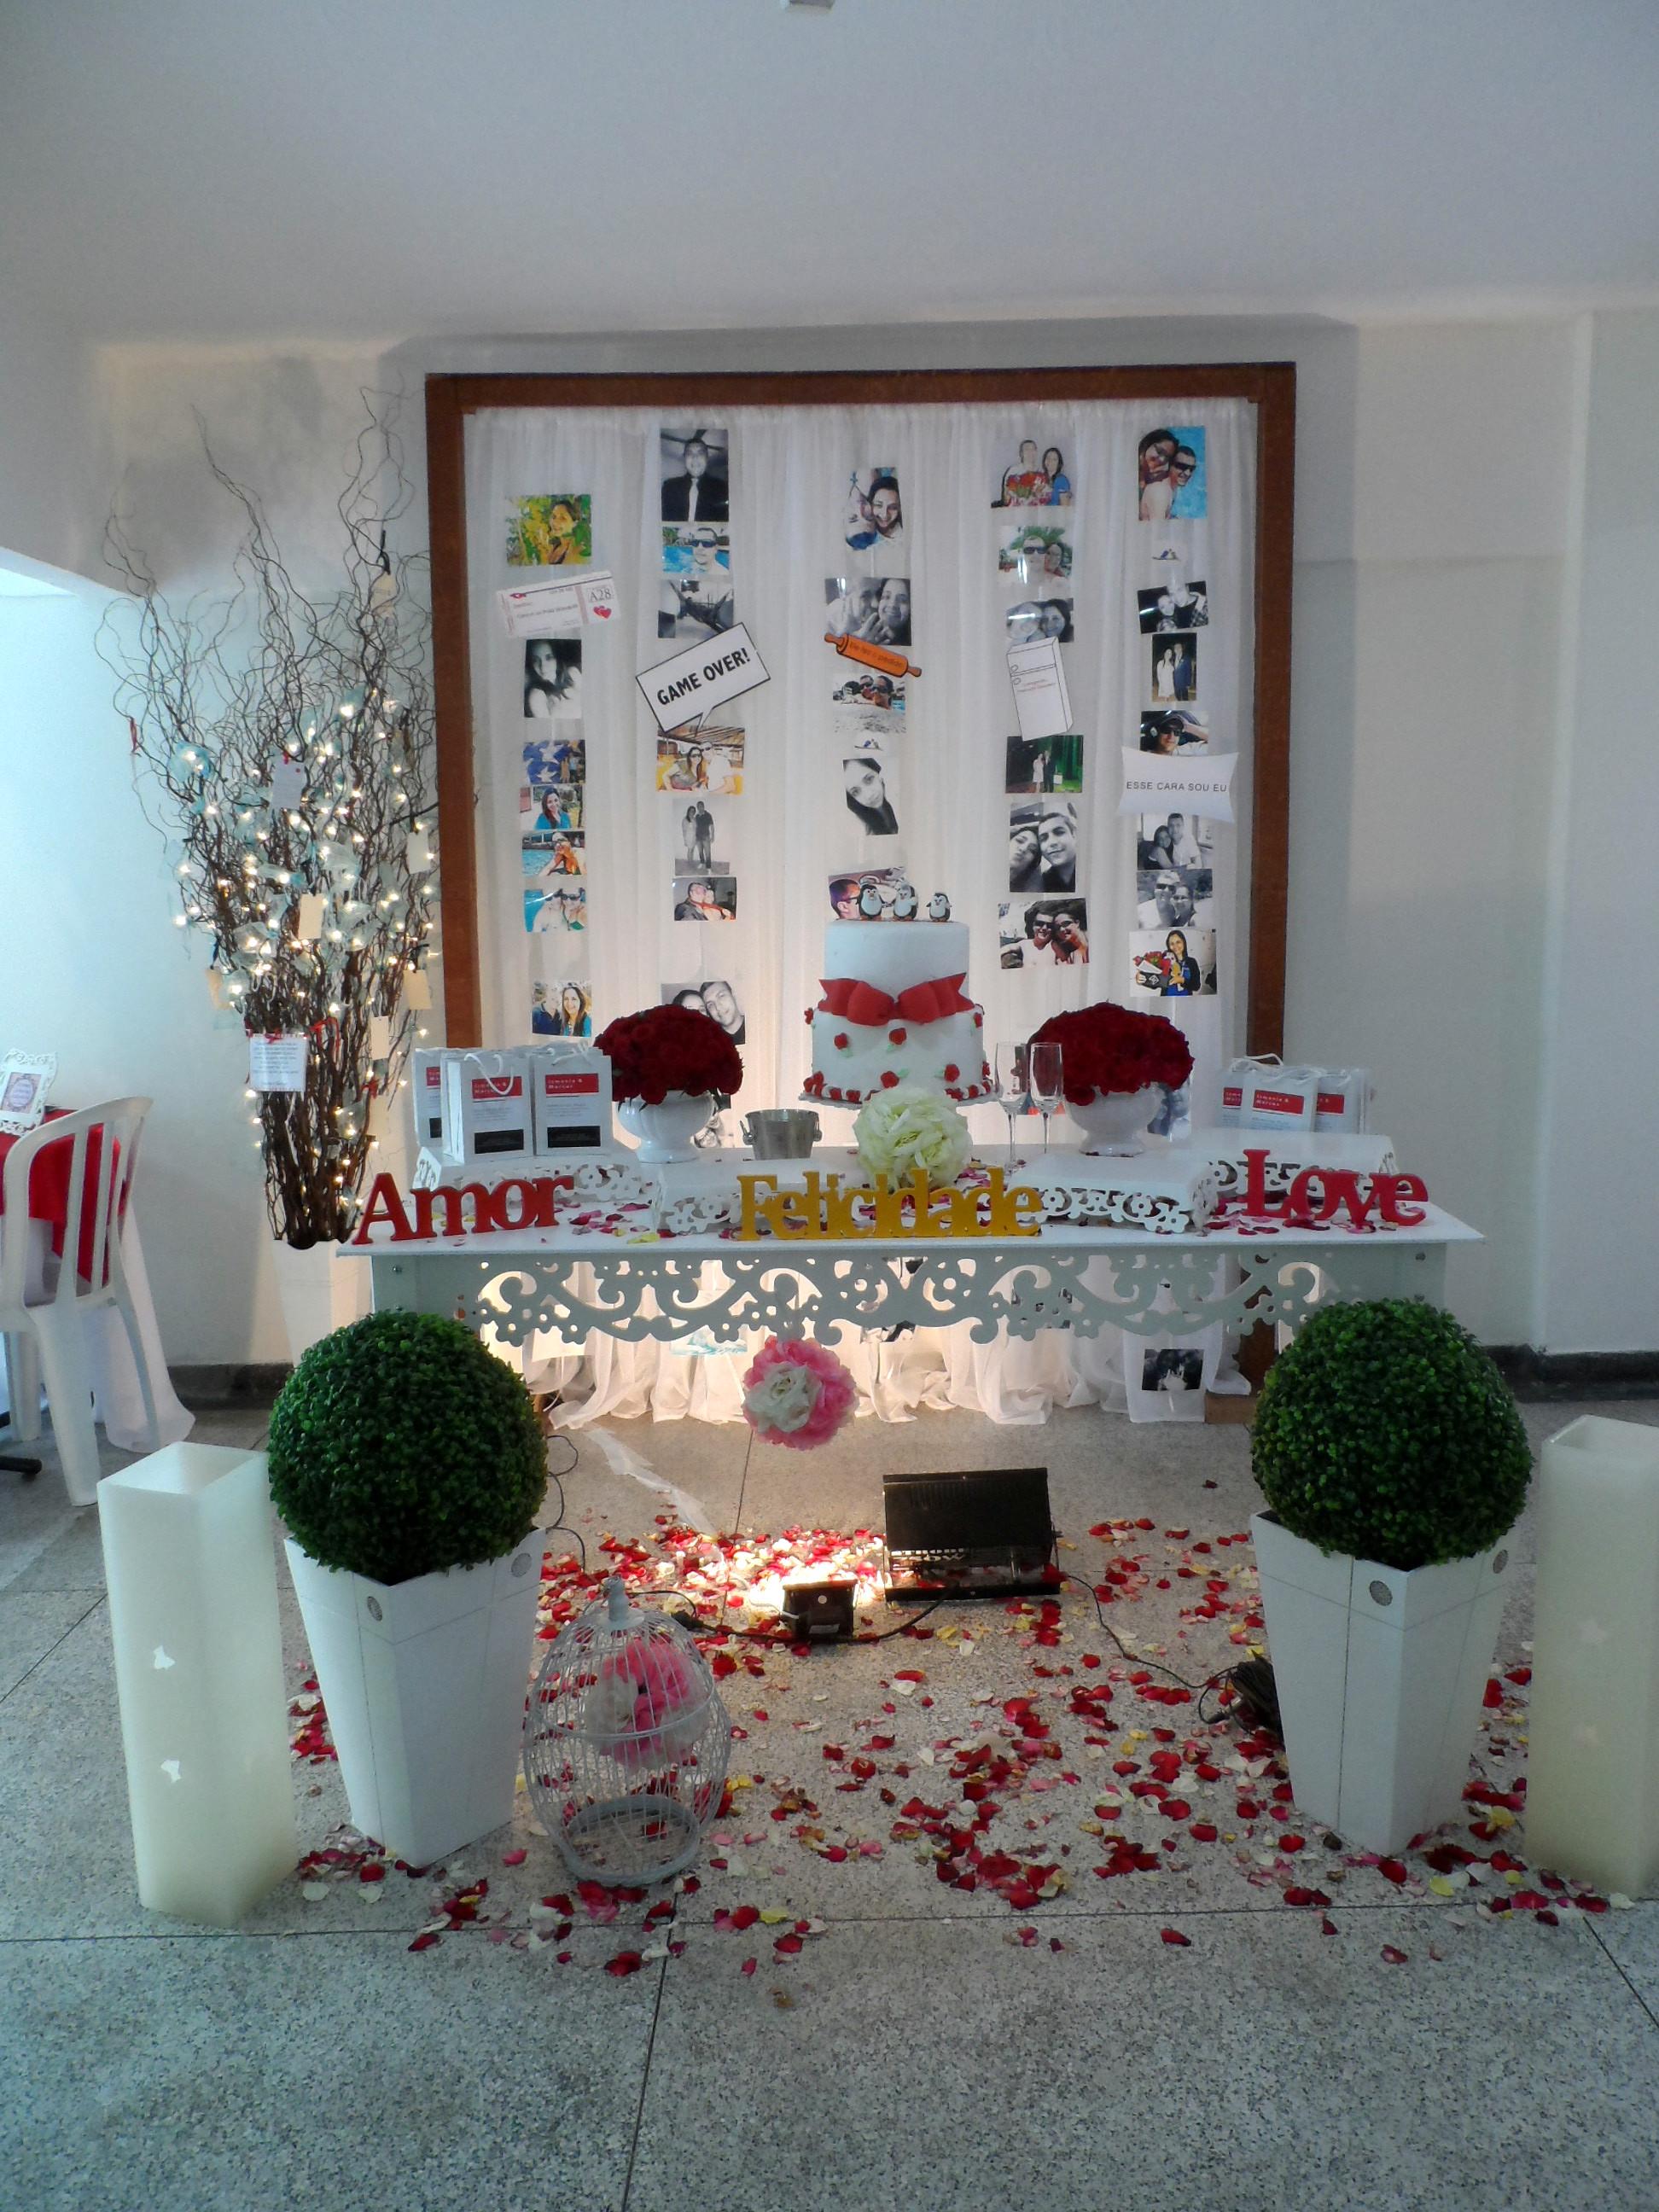 decoracao festa noivado:decoracao-noivado-provencal-decoracao-de-festa-provencal